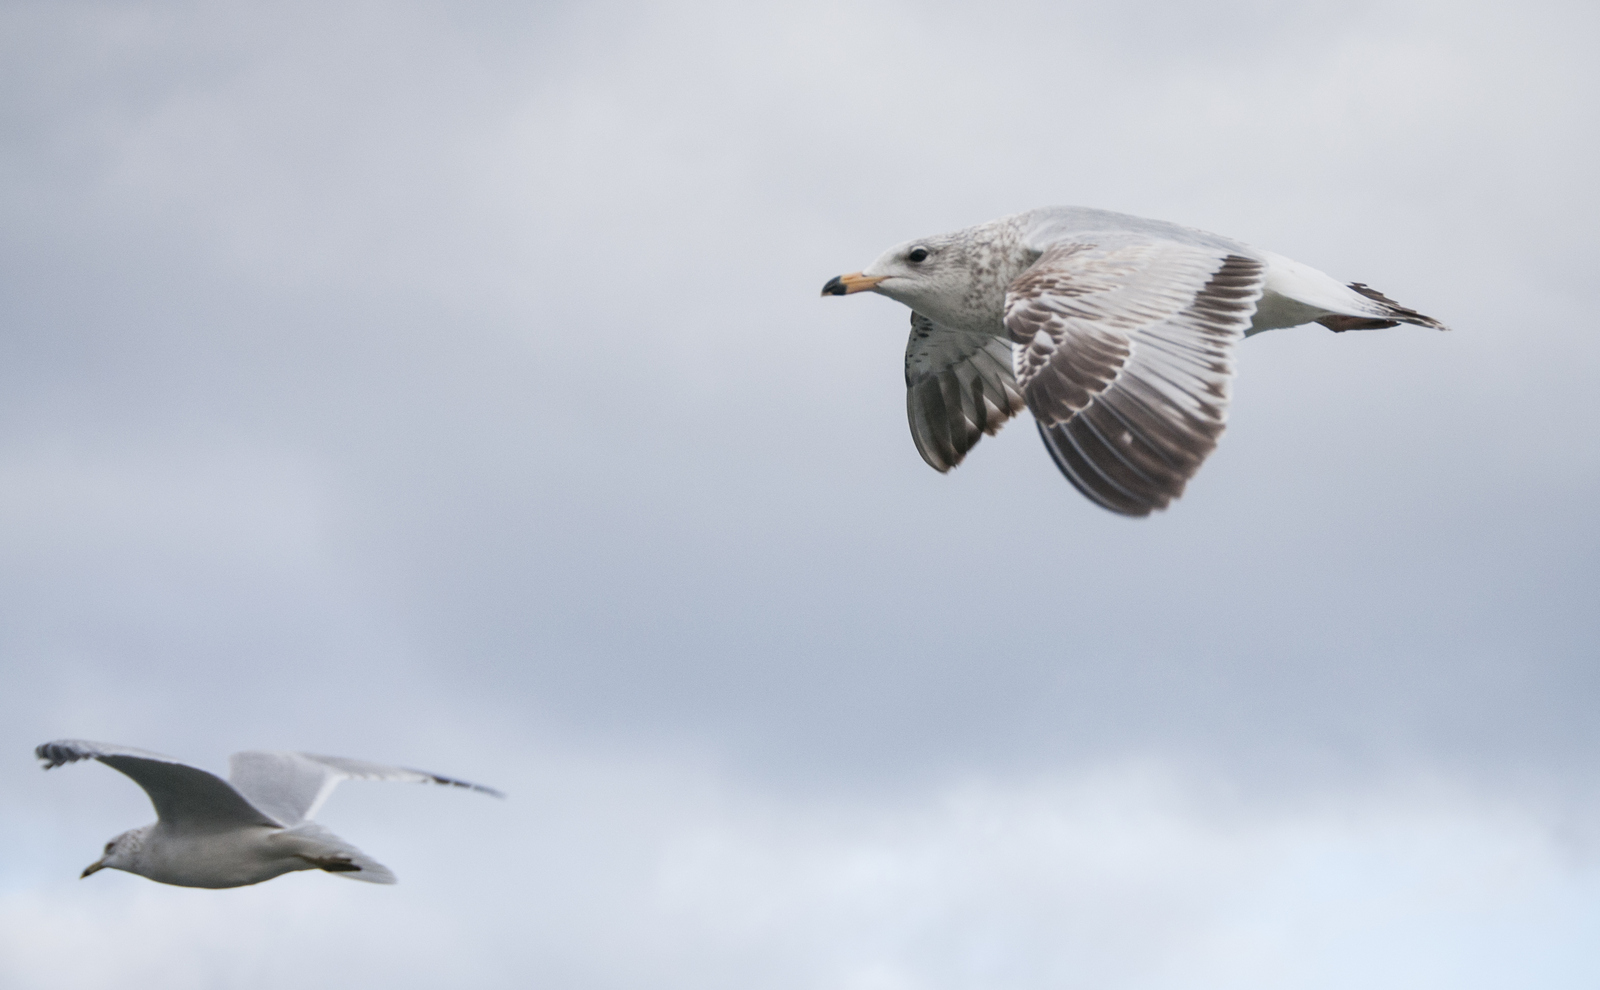 010116_seagulls-8